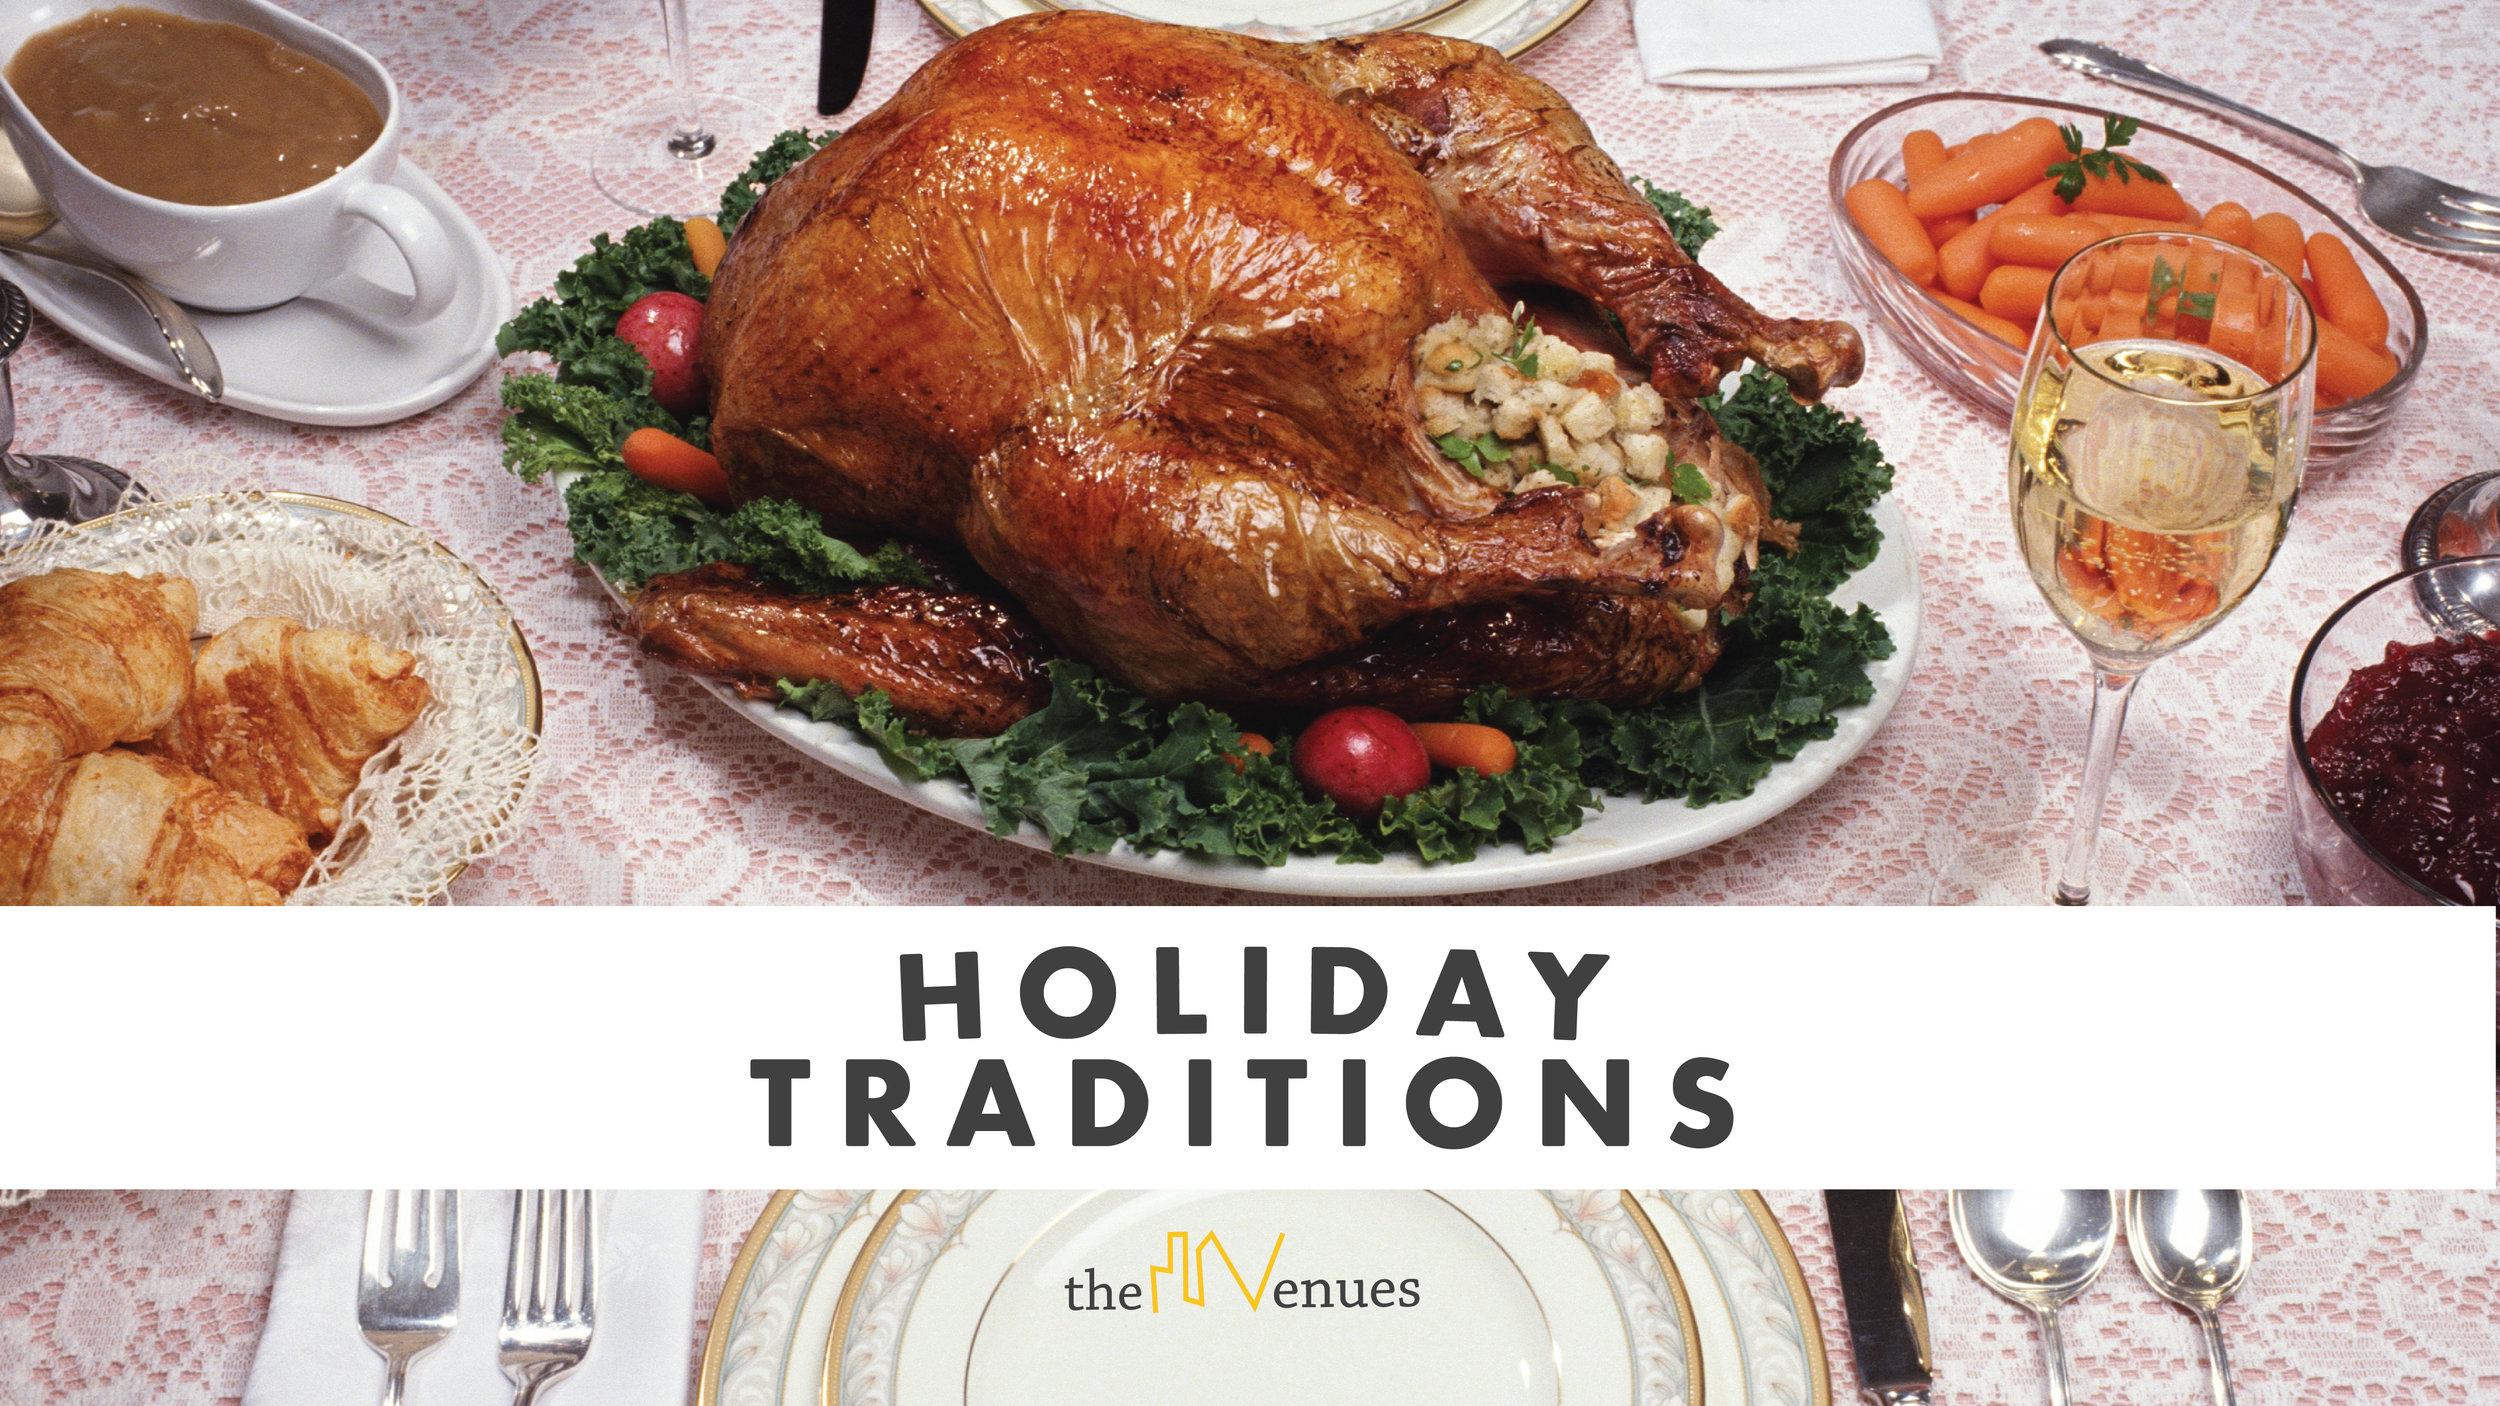 HolidayTraditionsSeries-01.jpg